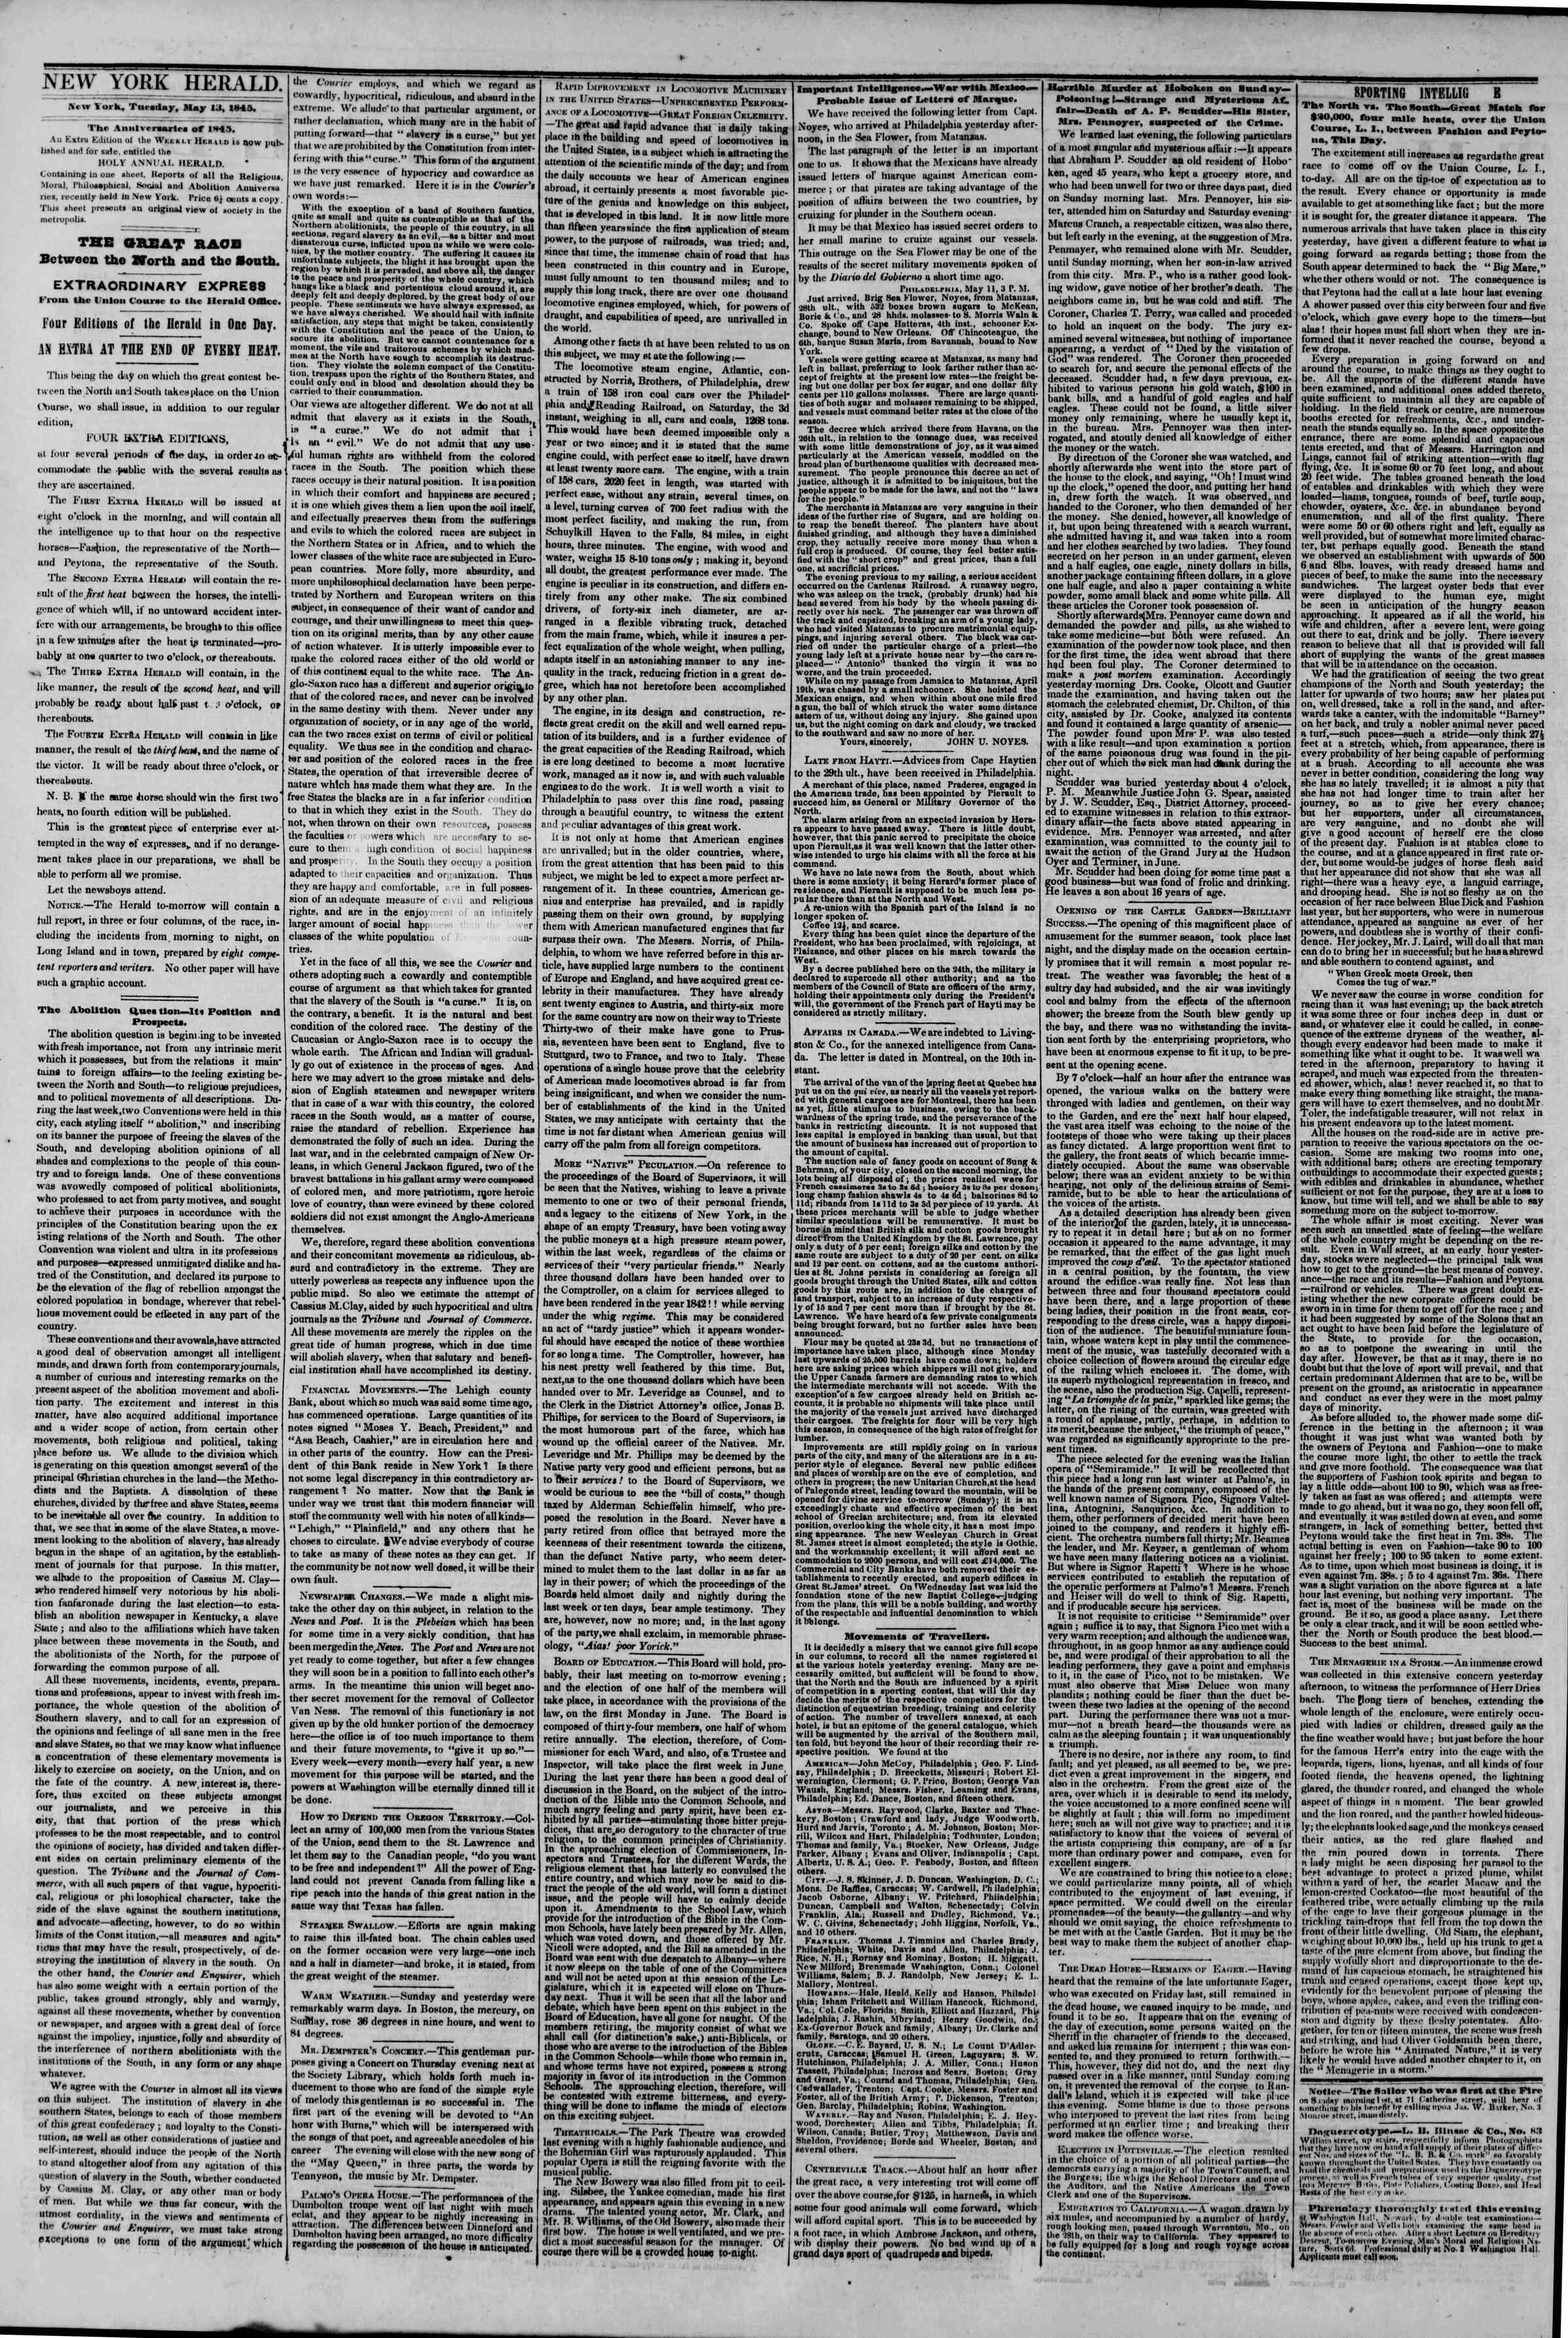 May 13, 1845 Tarihli The New York Herald Gazetesi Sayfa 2